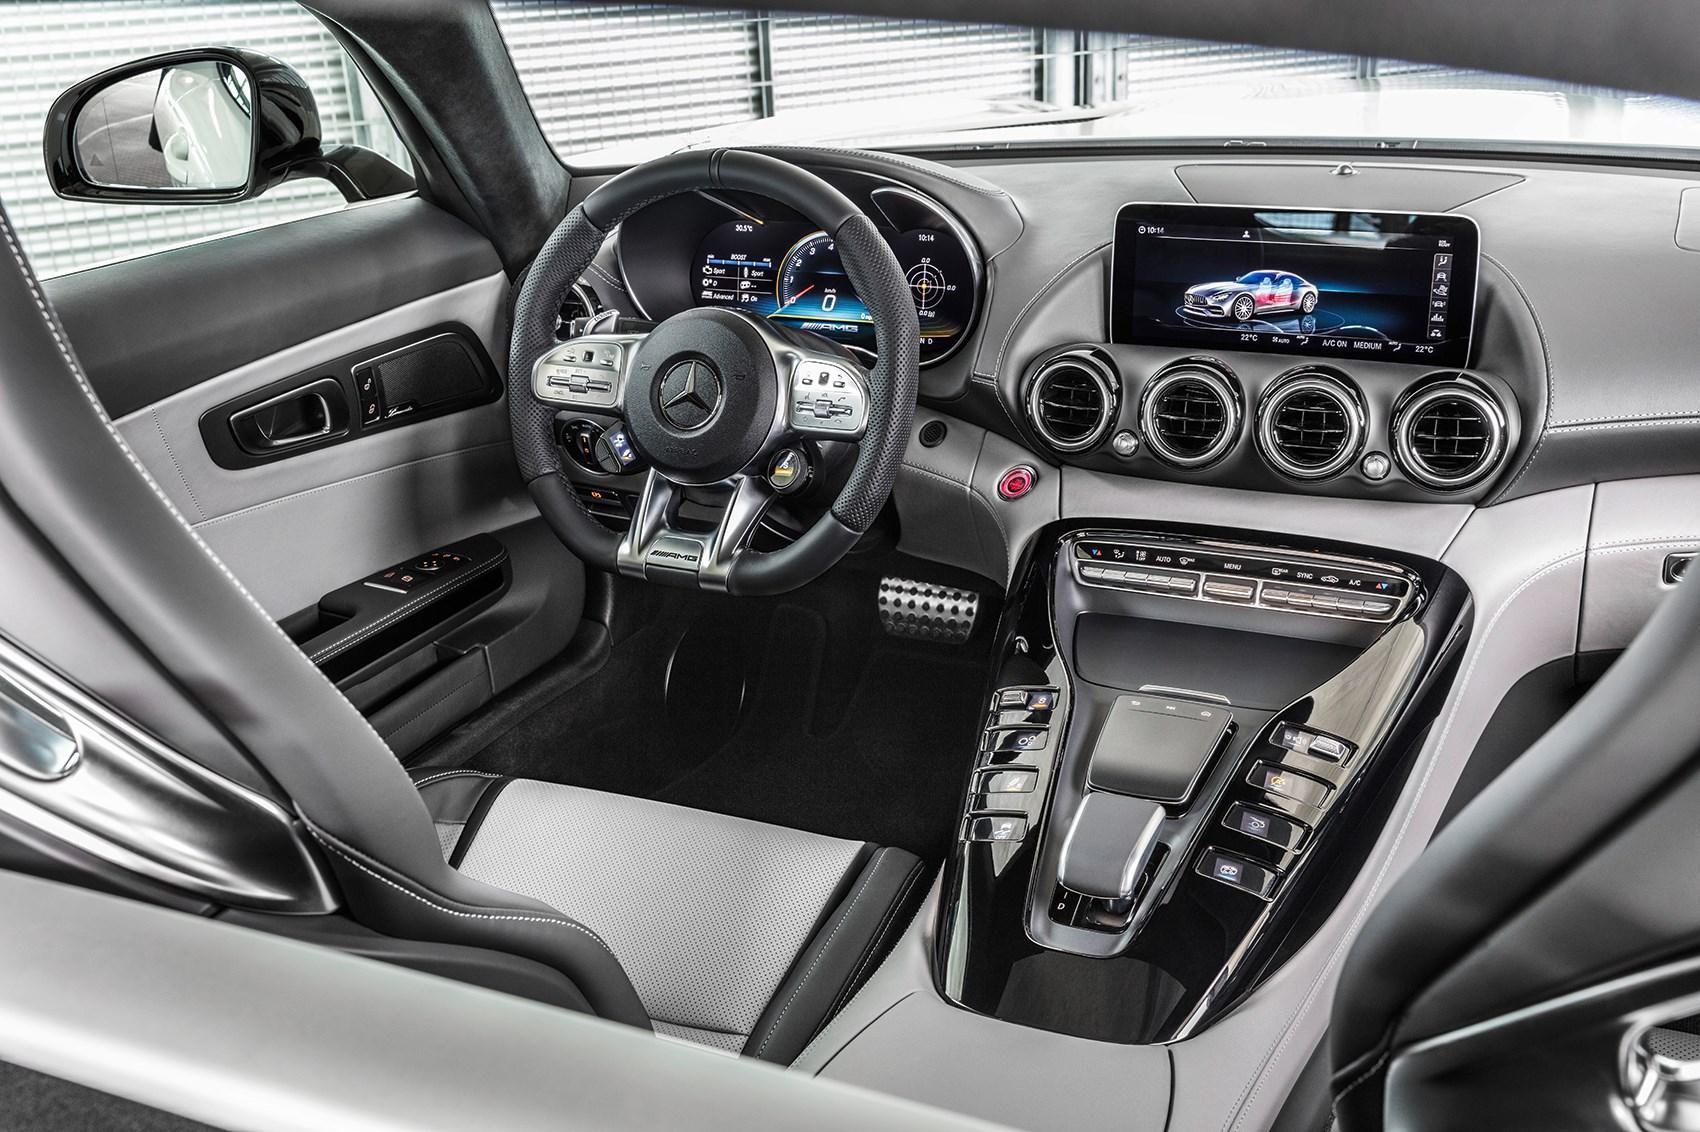 Amg Gt Roadster >> Mercedes Amg Gt R Roadster Revealed Ahead Of Geneva Car